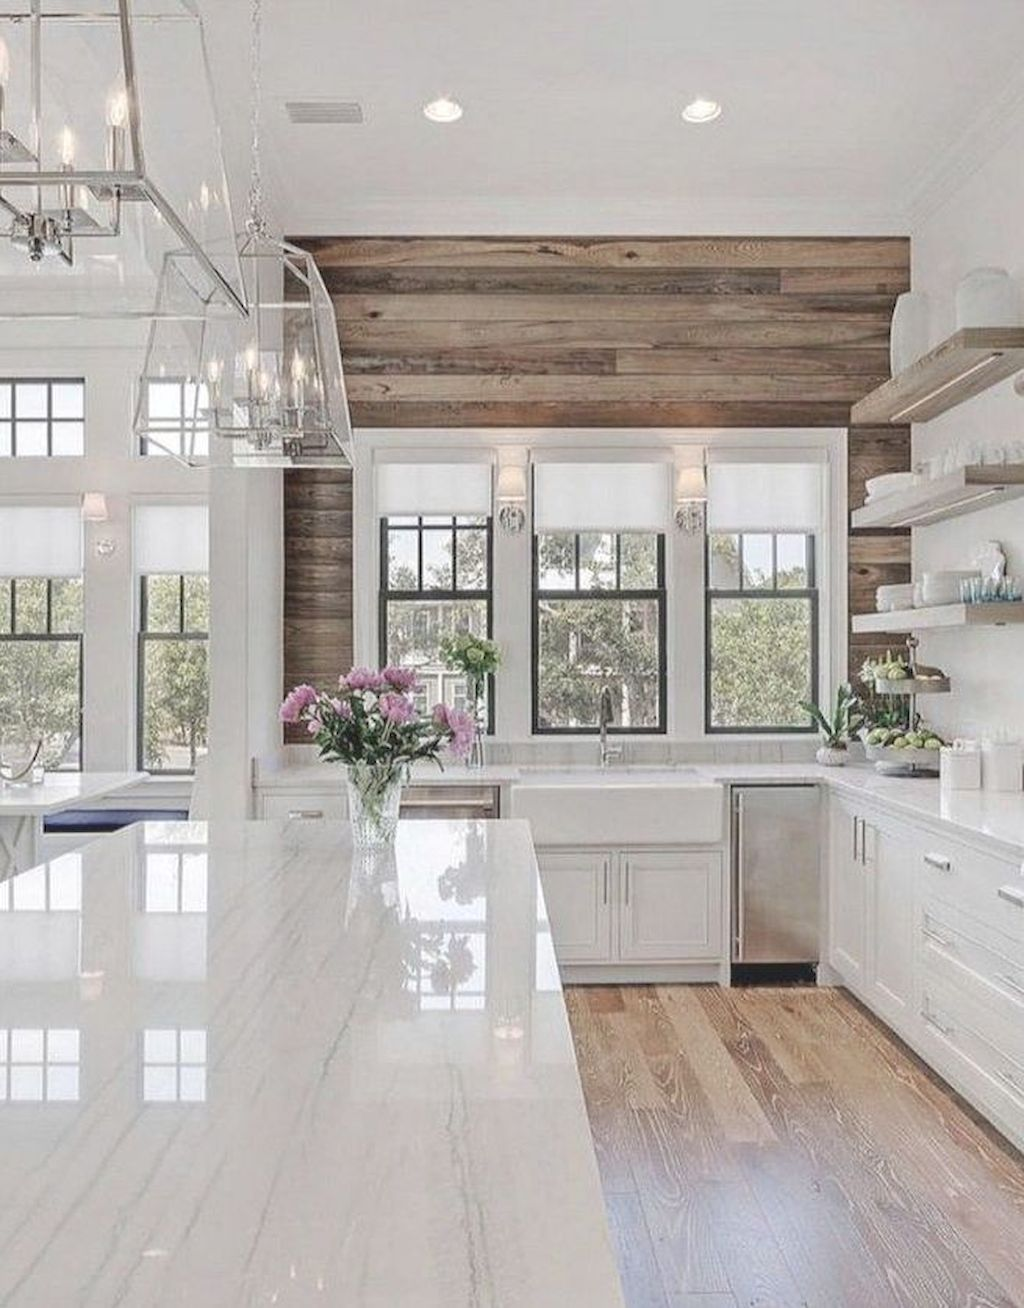 floors modern farmhouse kitchens farmhouse kitchen decor home decor kitchen on kitchen decor ideas farmhouse id=70483